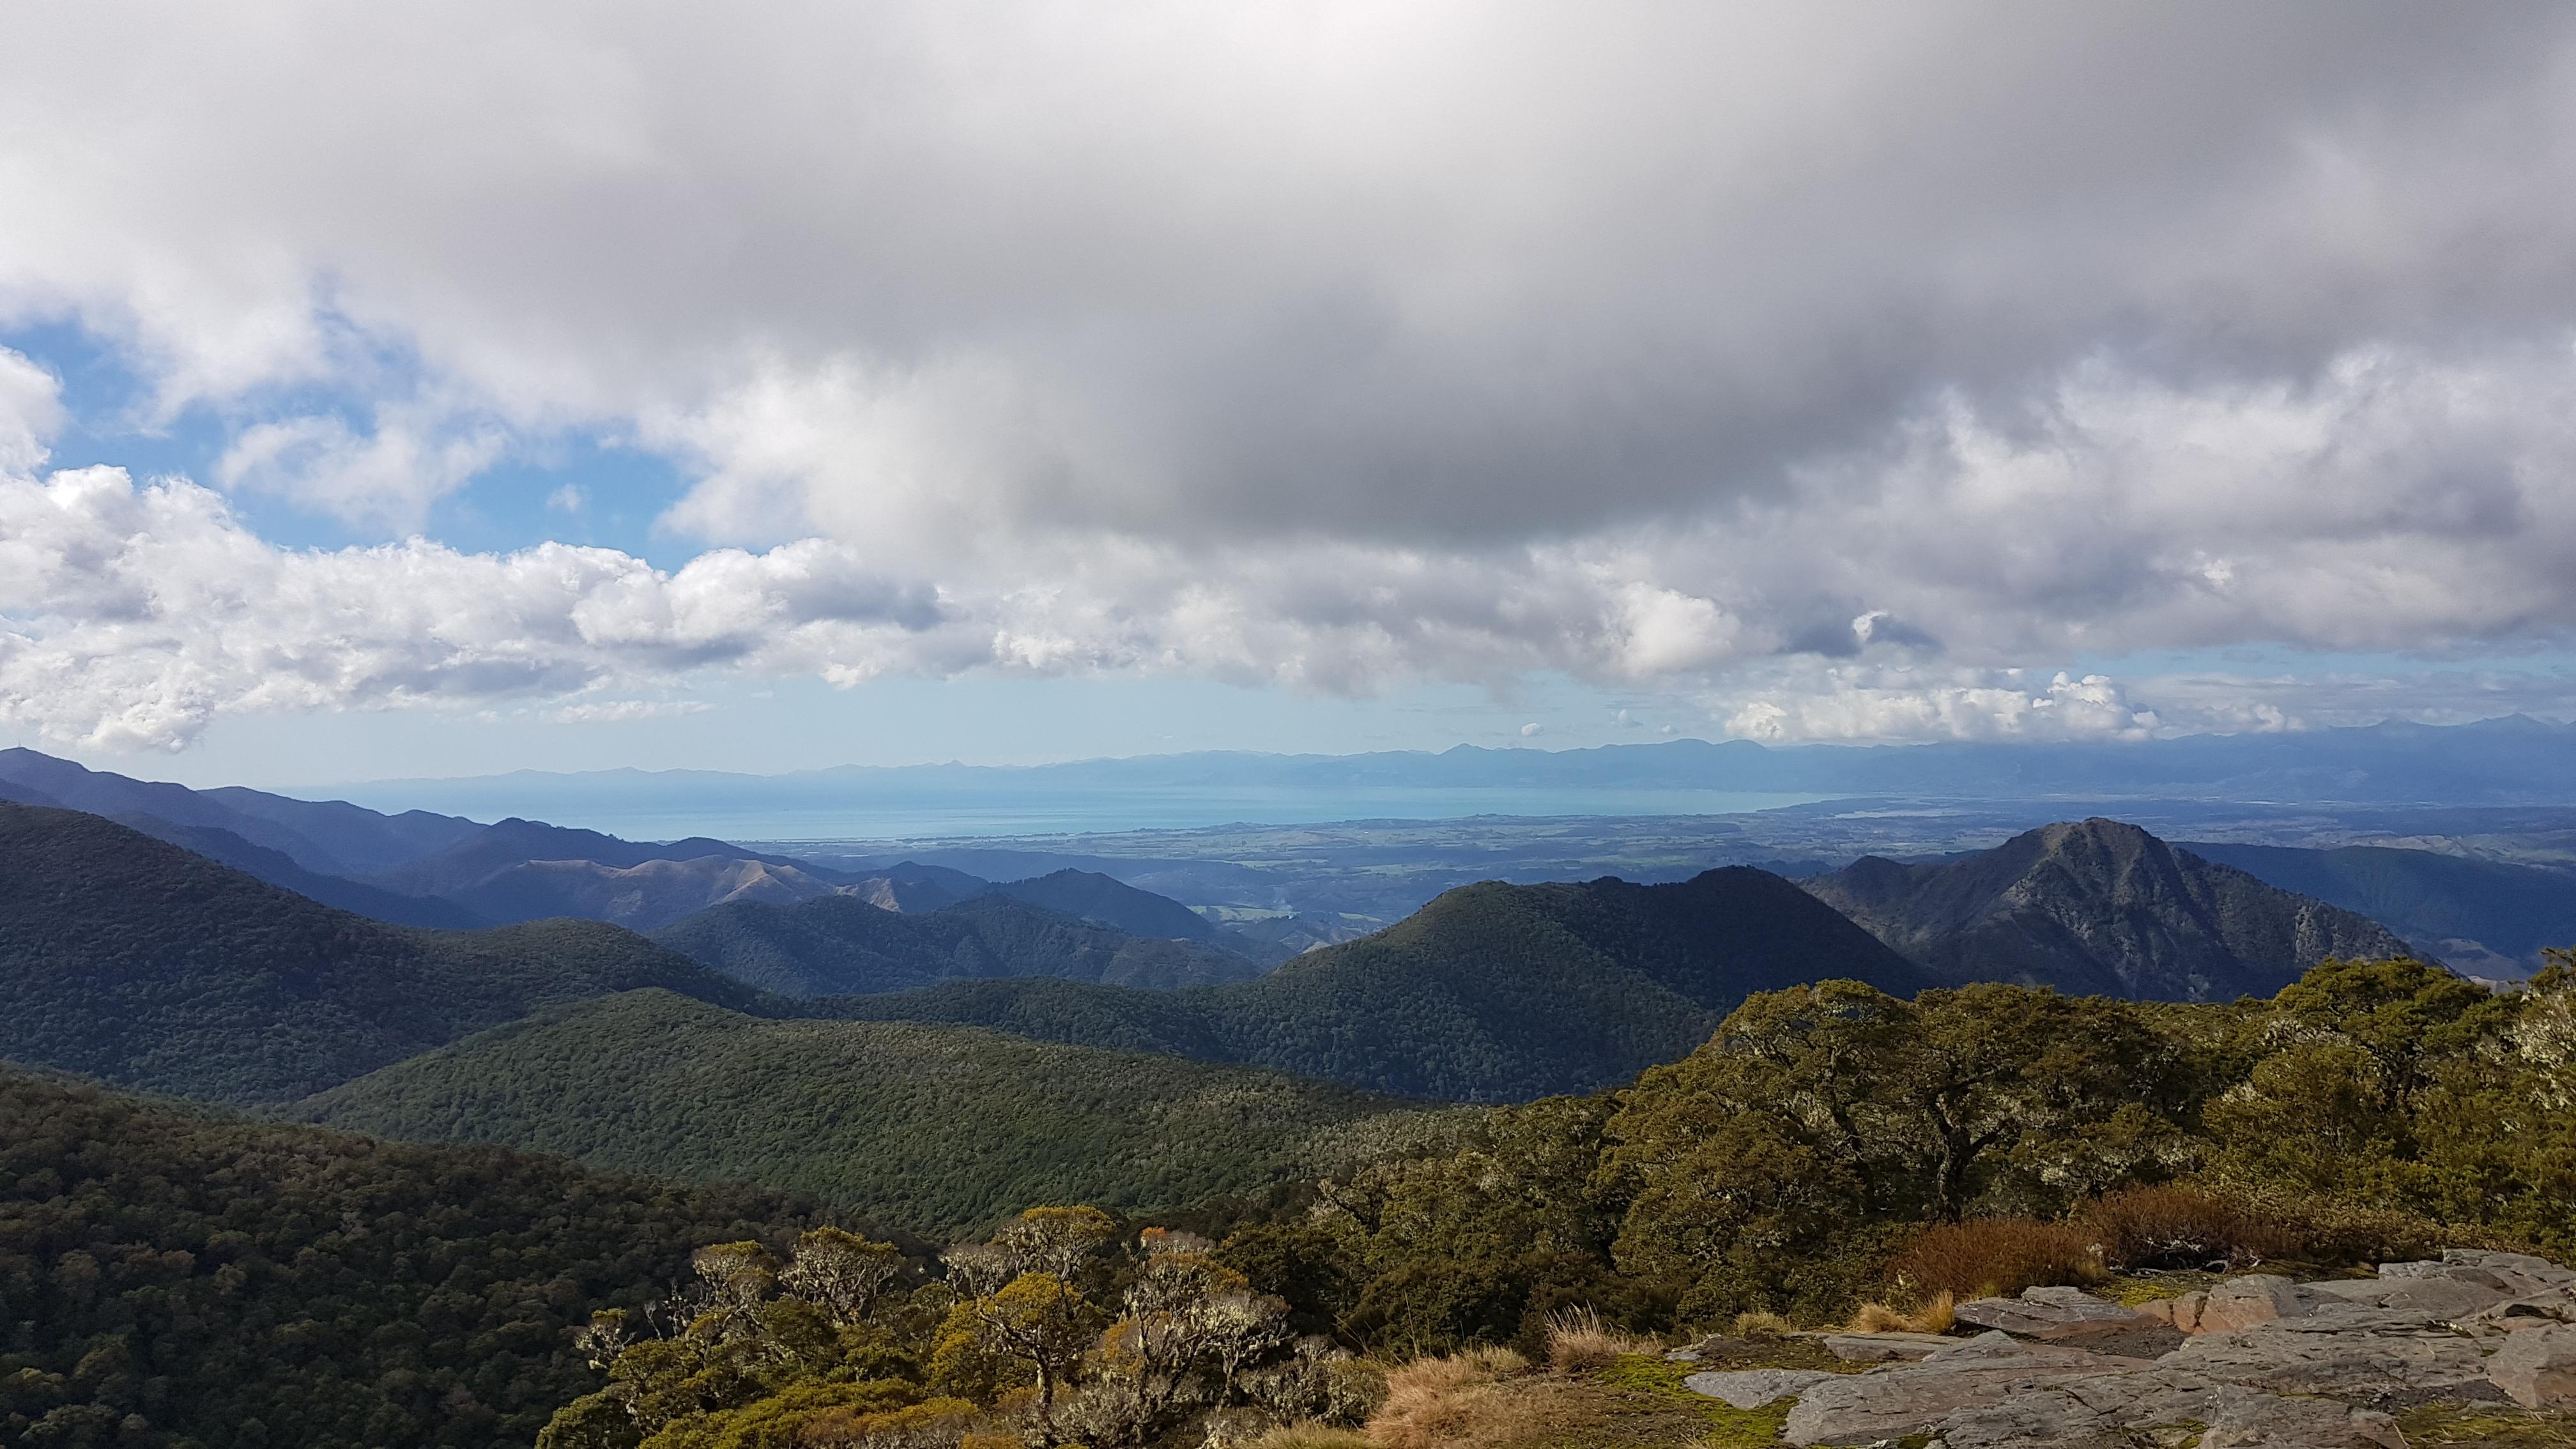 Tasman Bay view from above Mt Arthur hut